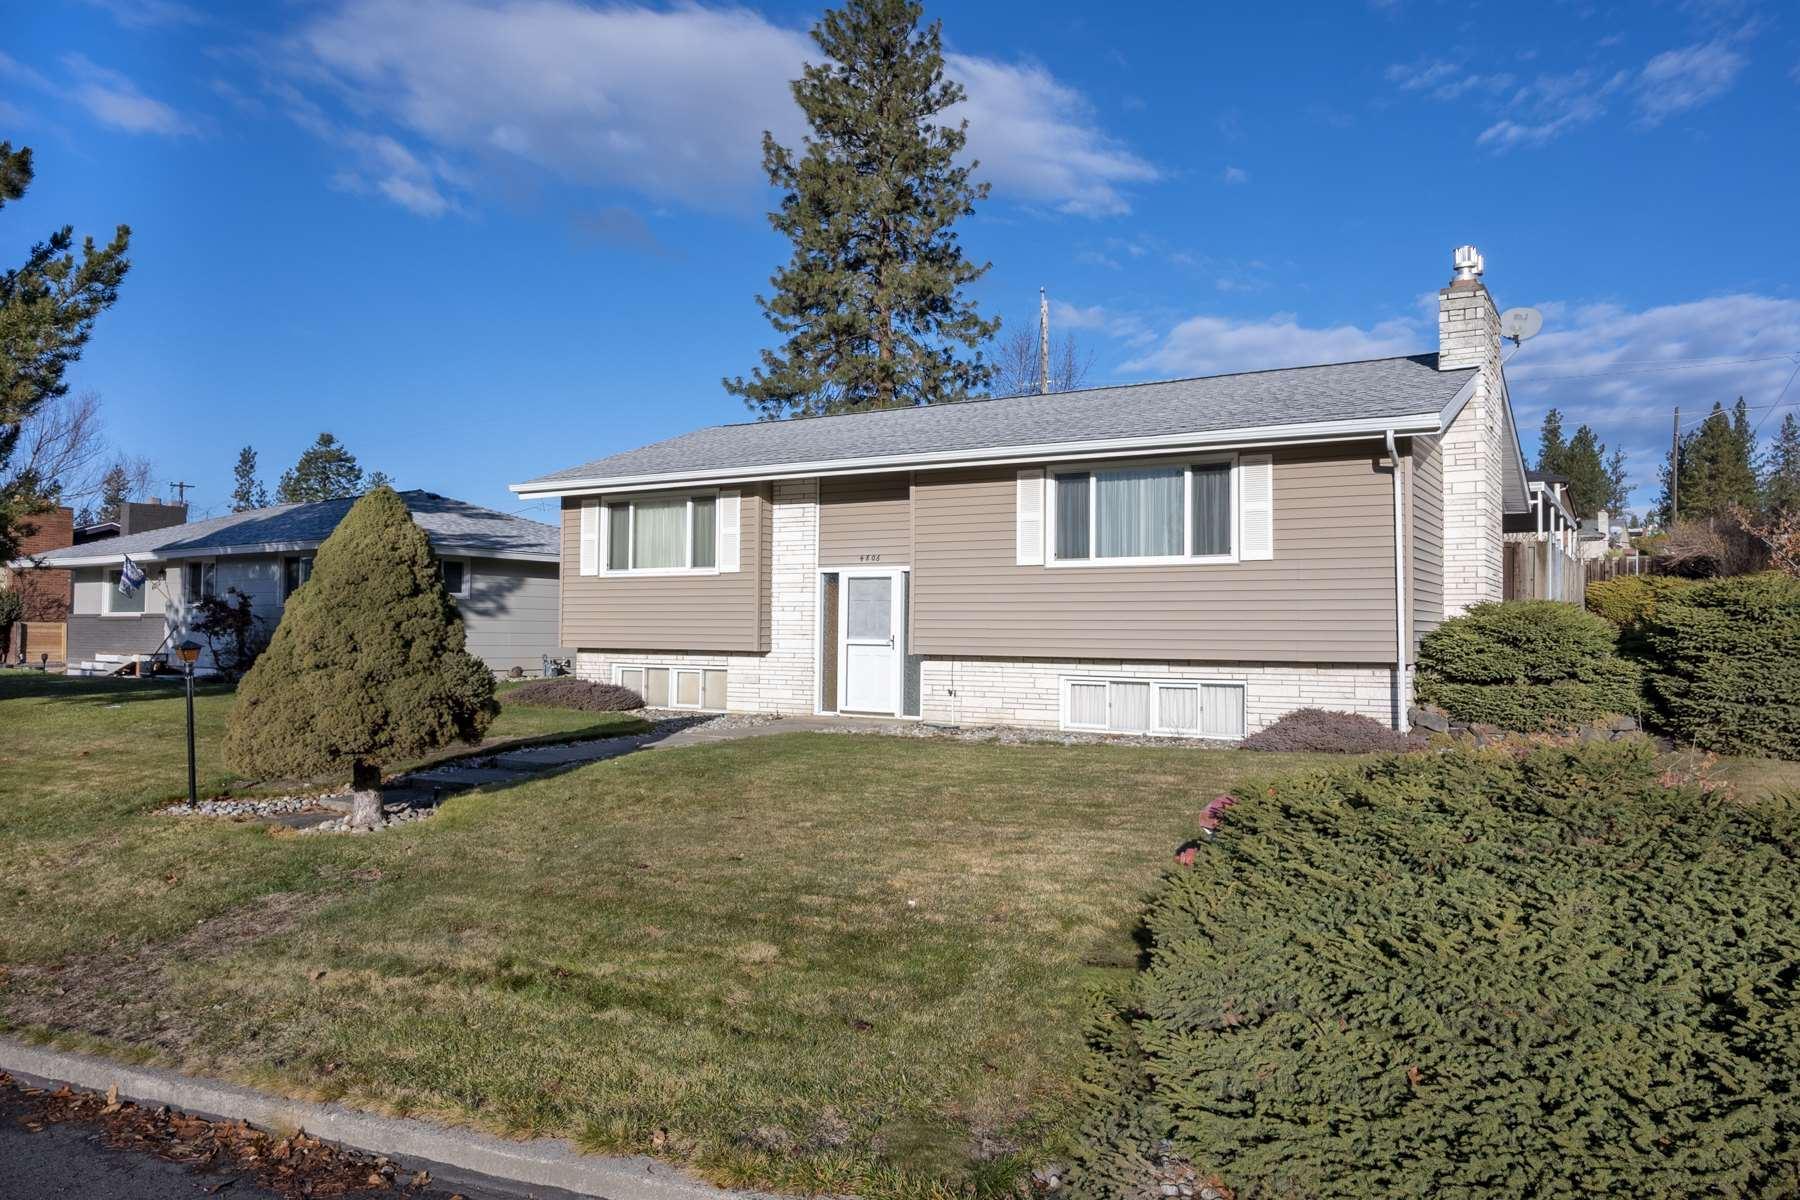 4806 W Rosewood Ave, Spokane, WA 99208-373 - #: 202025961